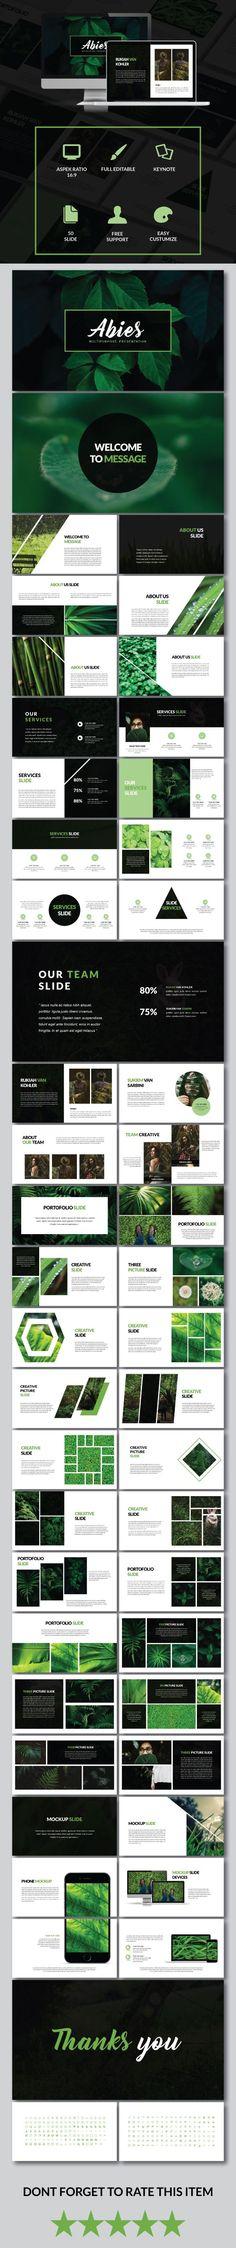 Abies - Multipurpose Keynote Template #design